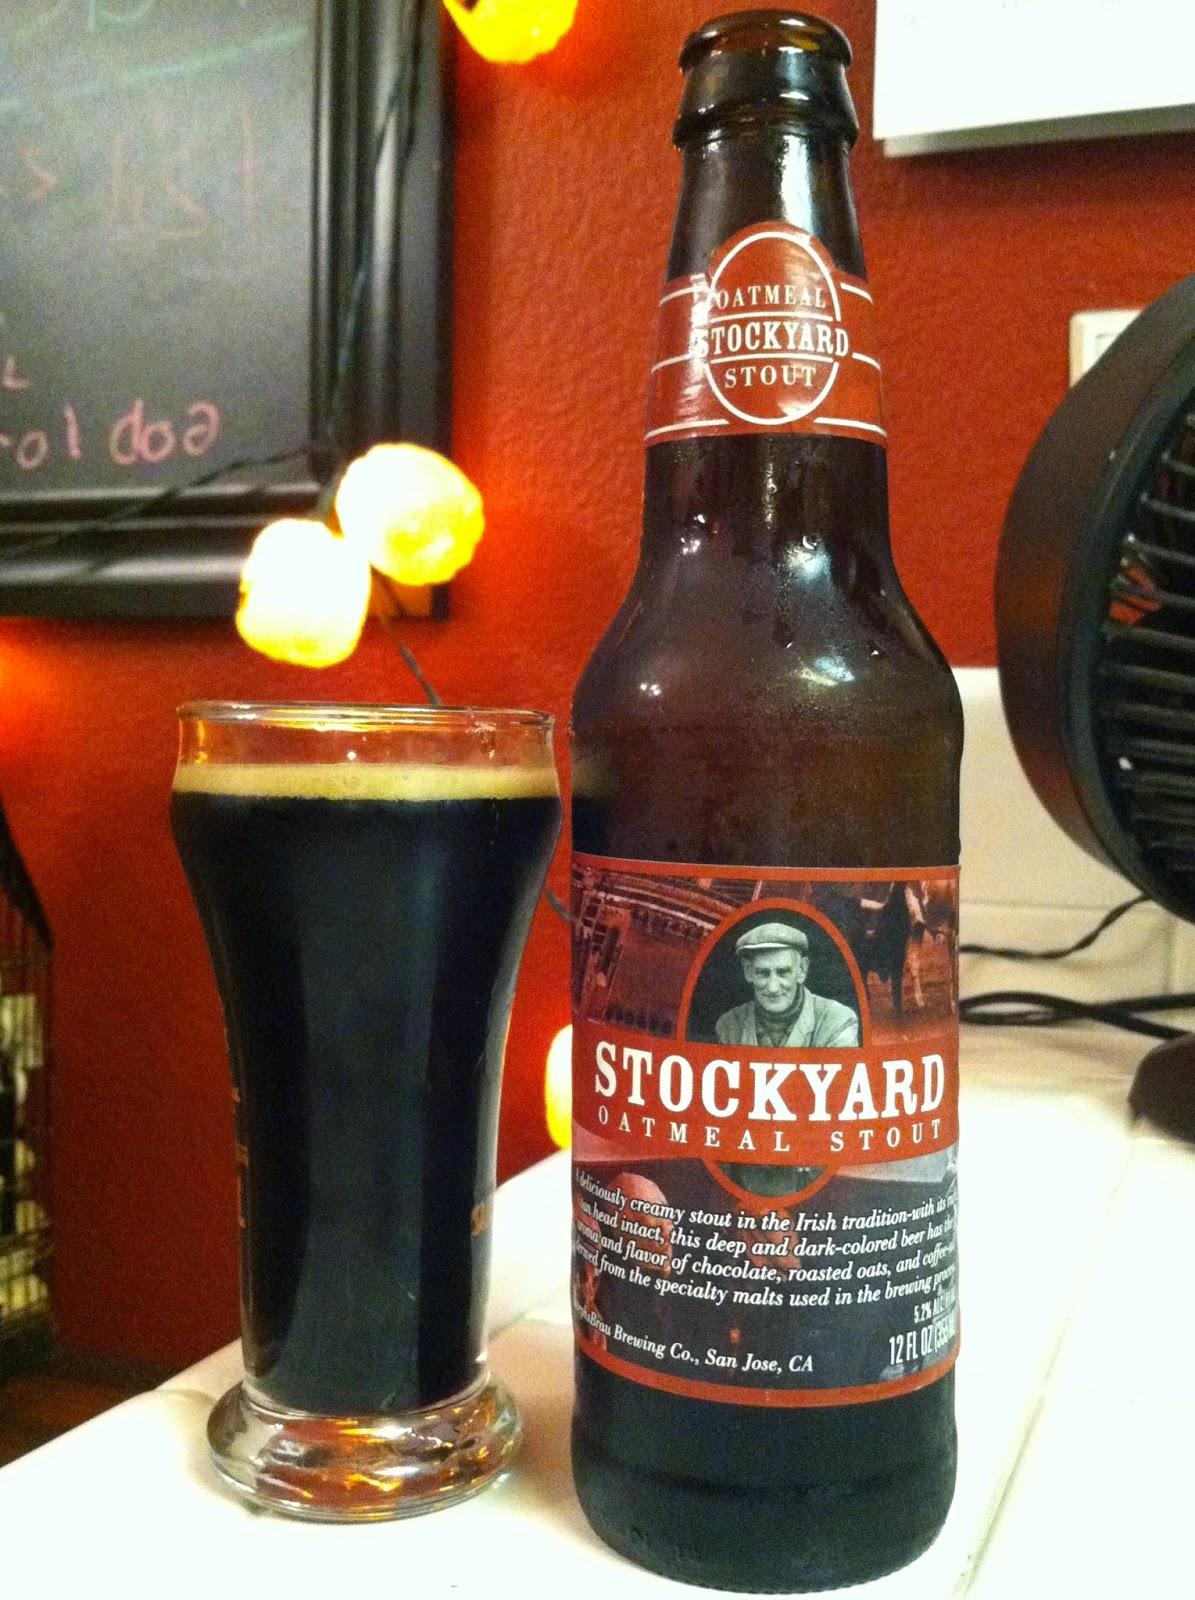 Stockyard Oatmeal Stout 1